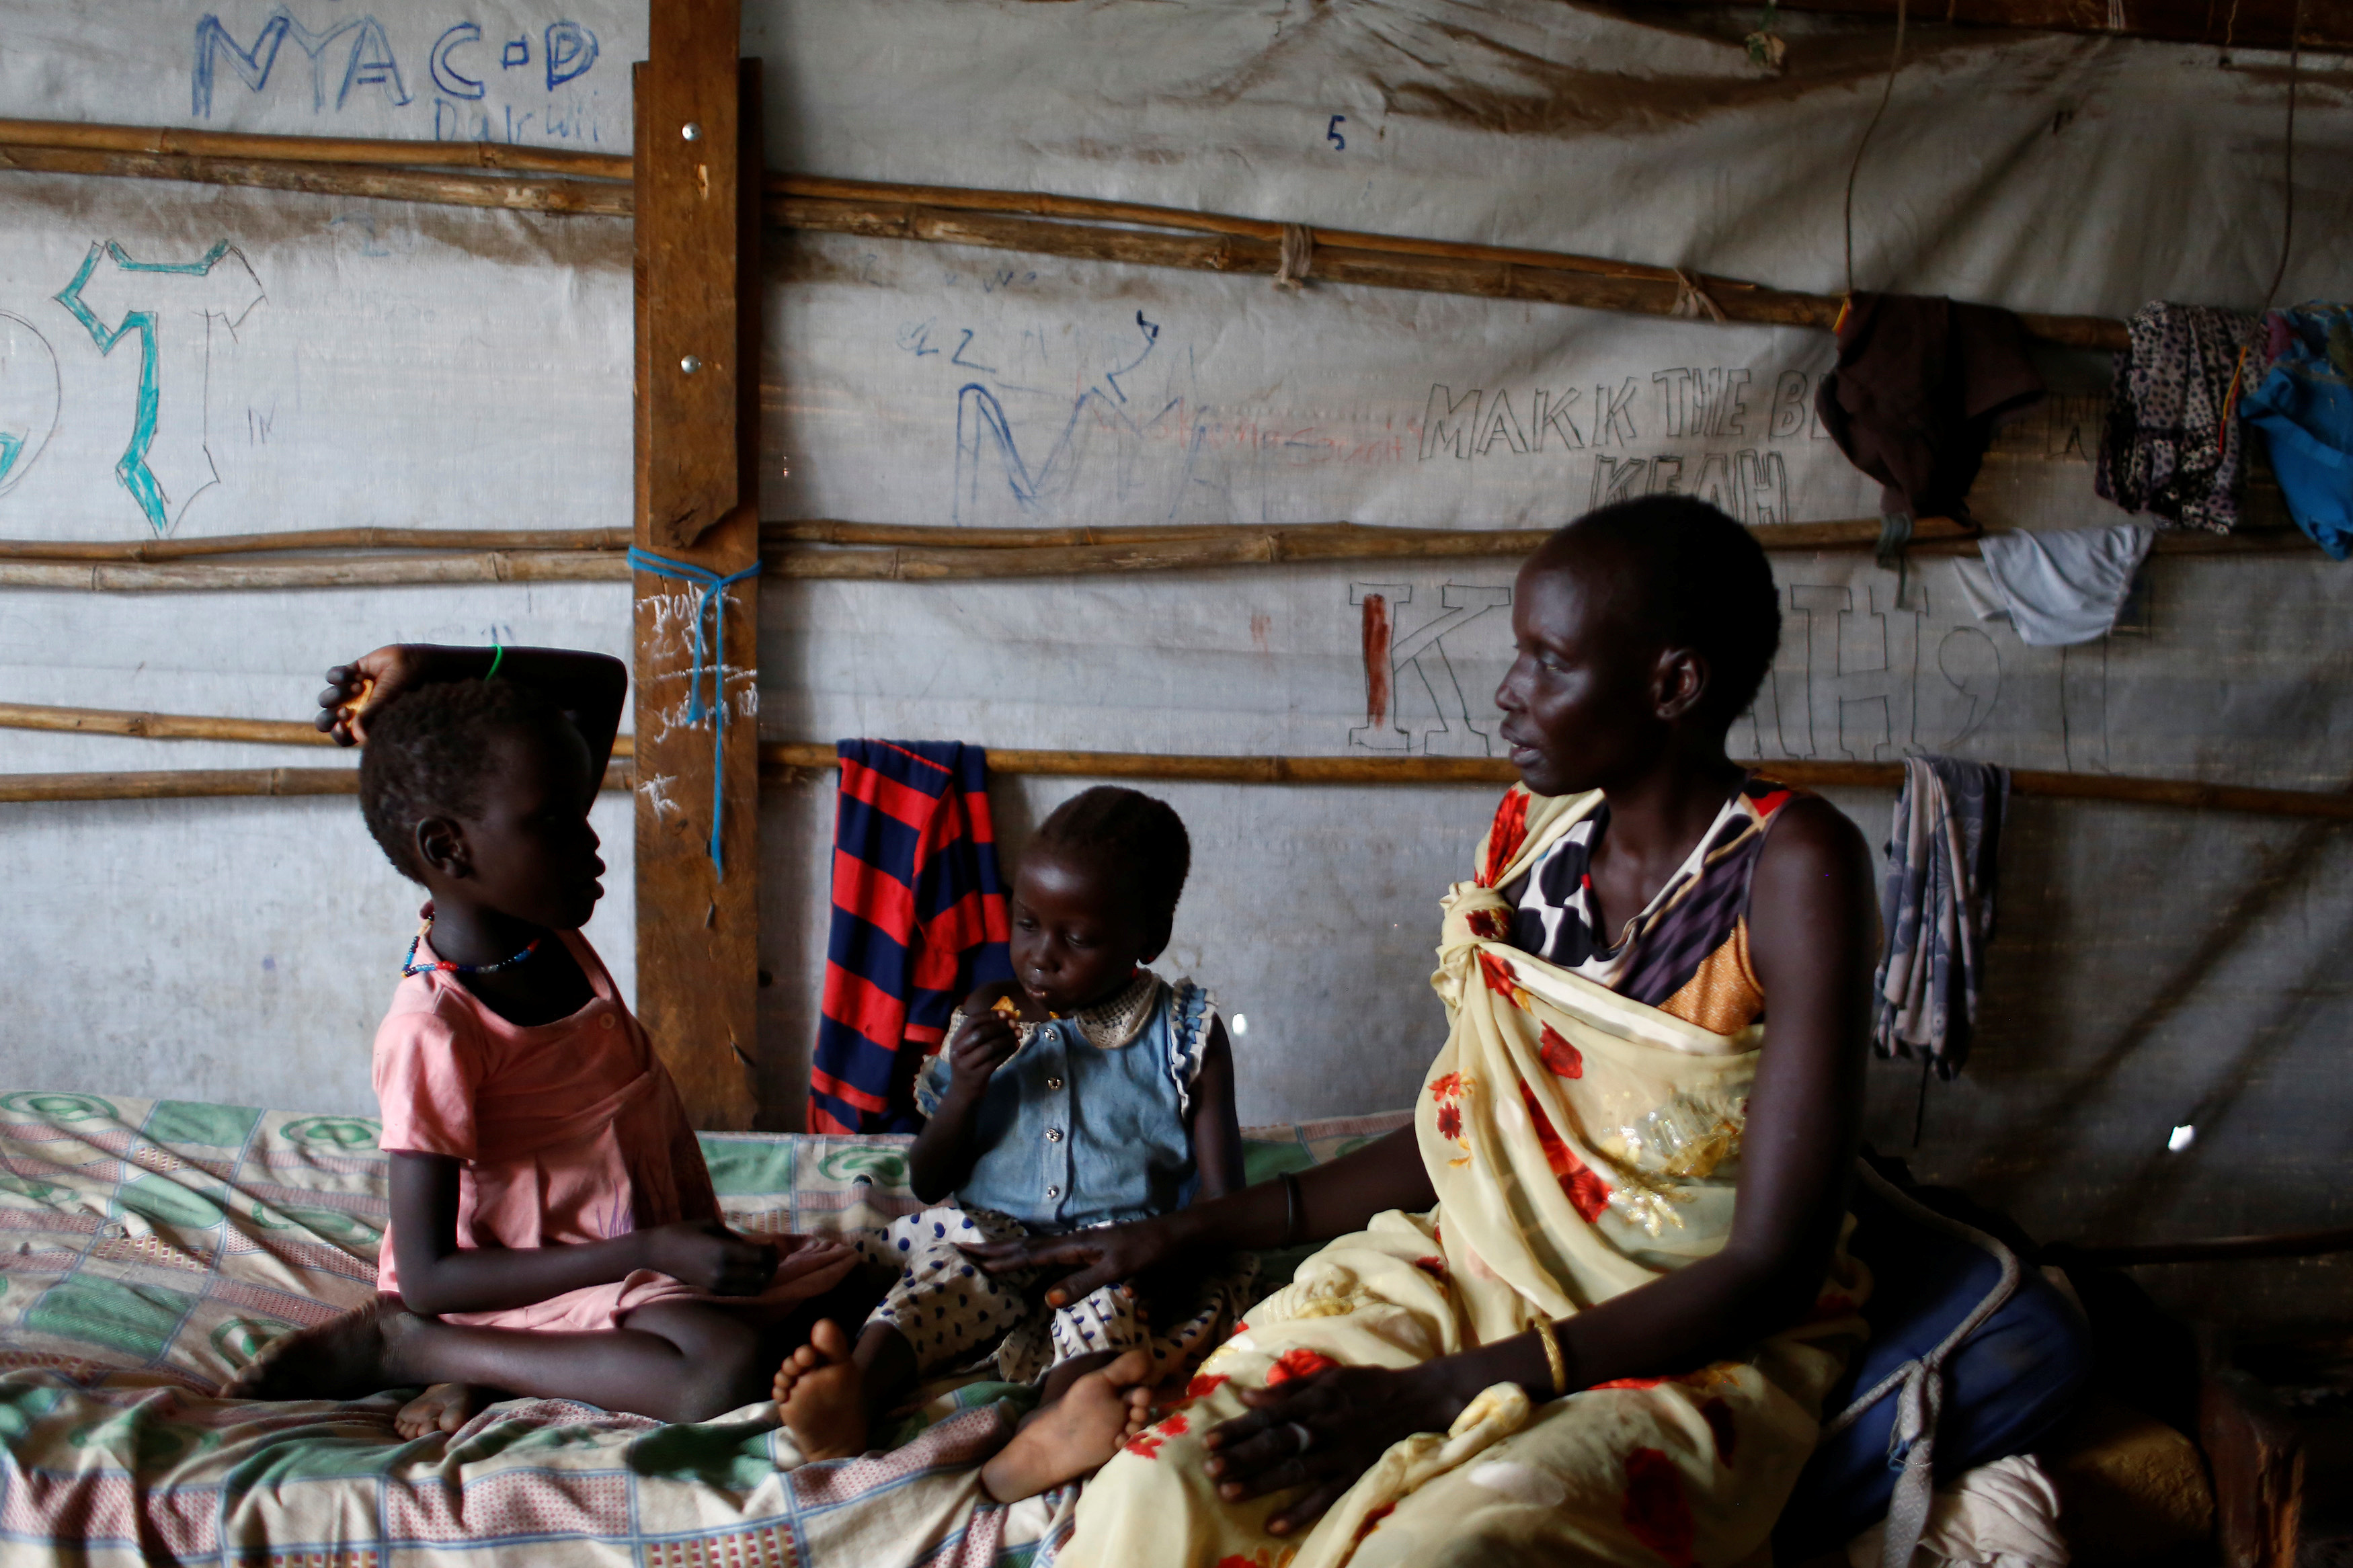 Gender equality inequality Africa women girls gender safety